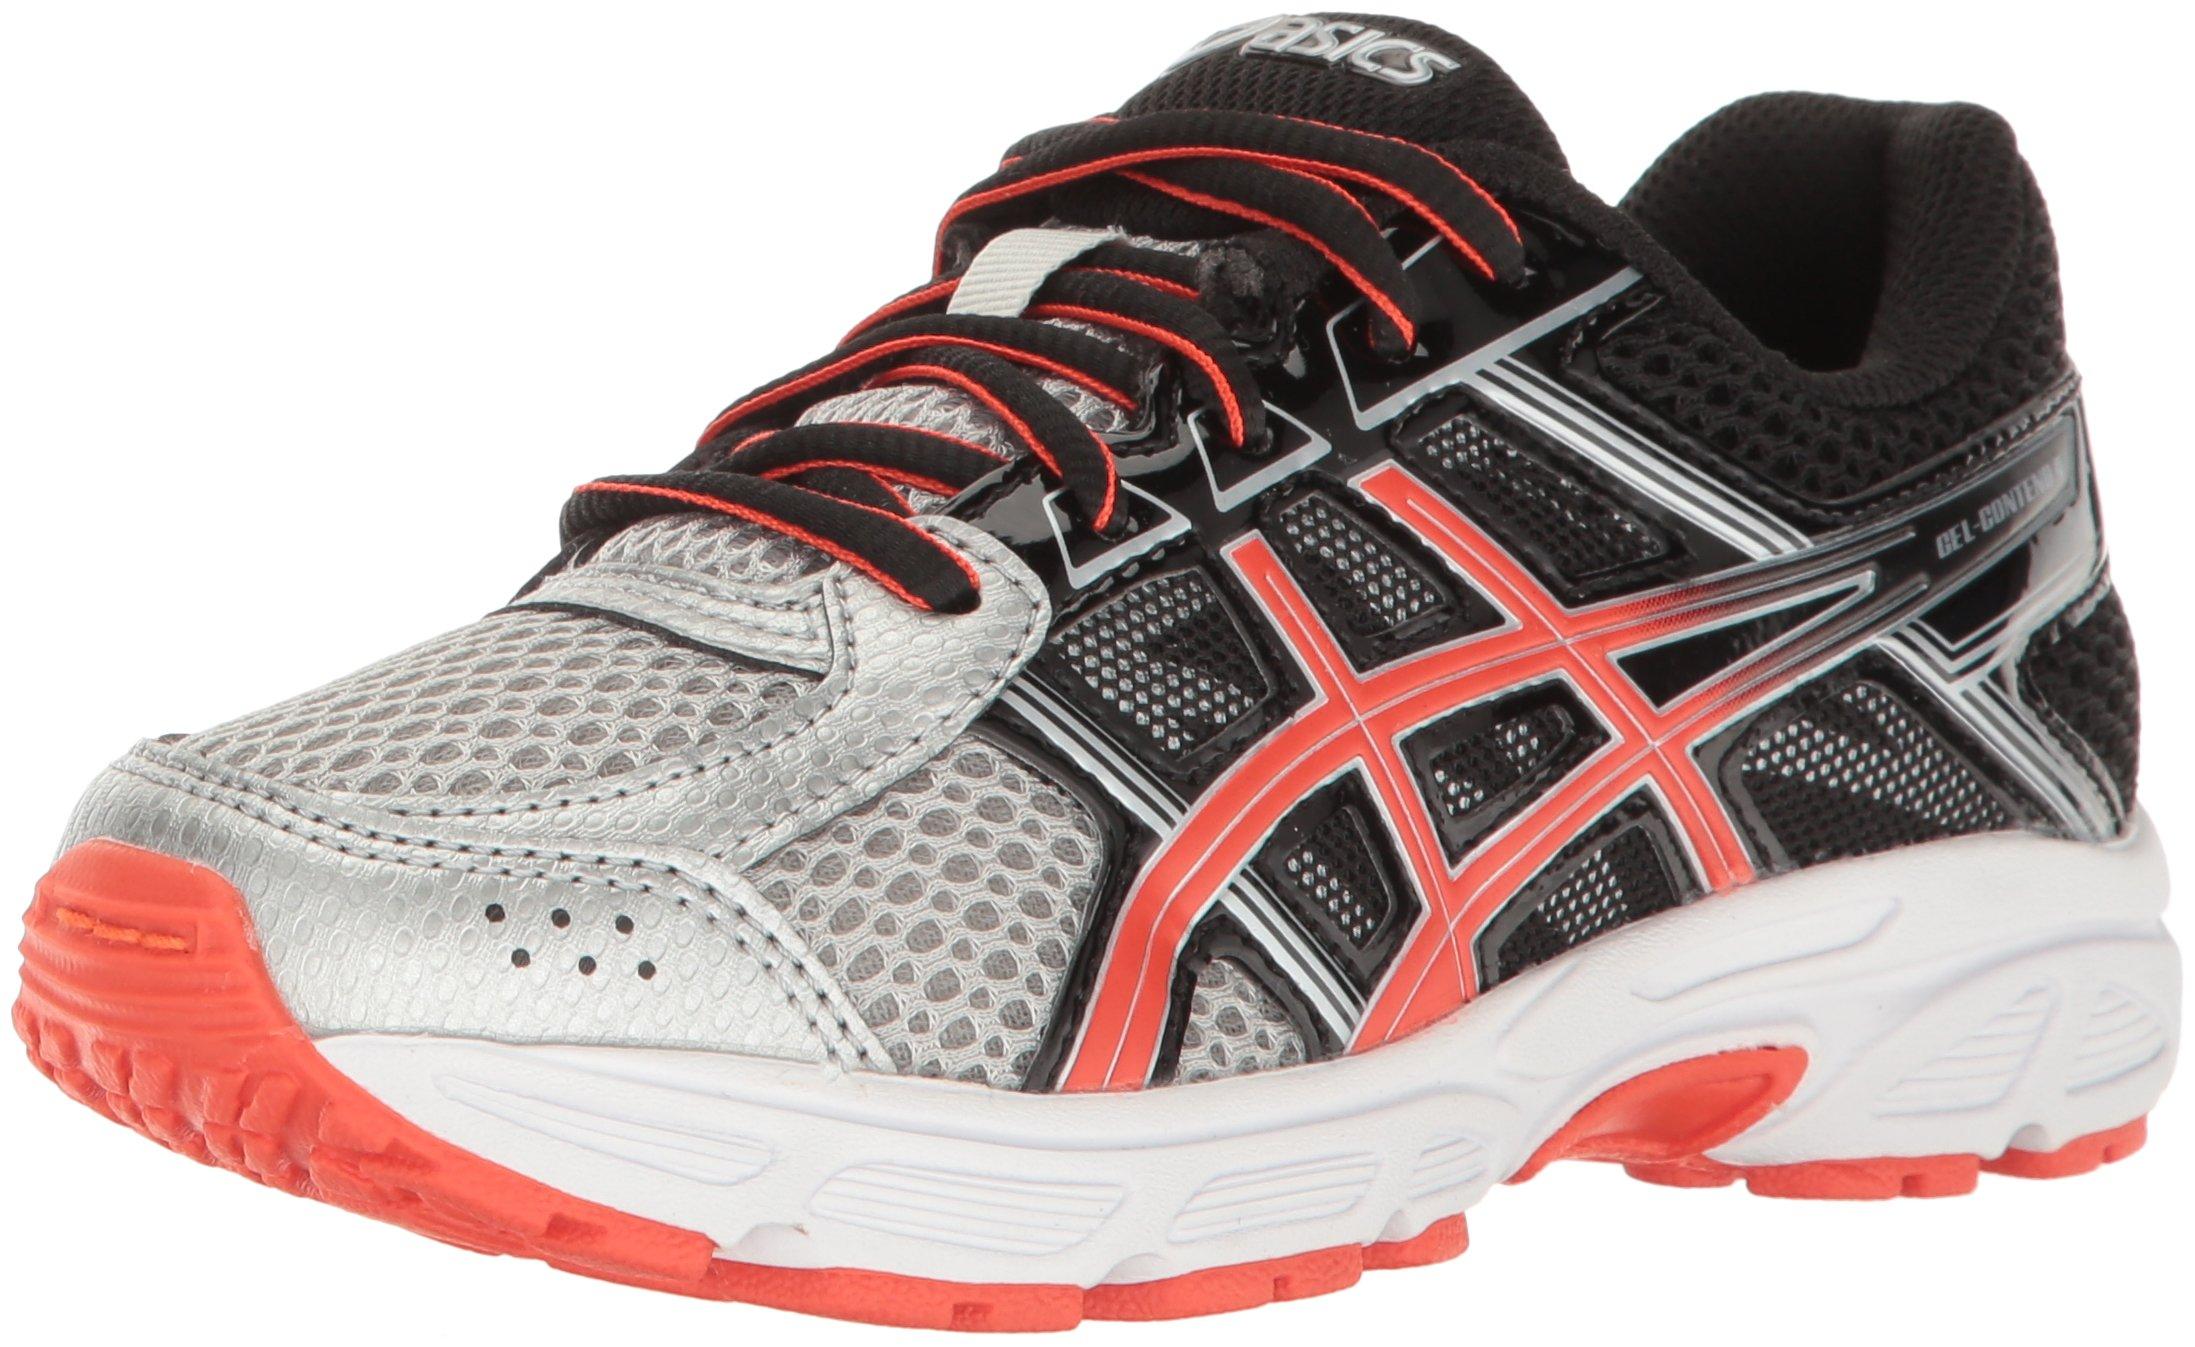 ASICS Unisex-Kids Gel-Contend 4 GS Running Shoe, Silver/Cherry Tomato/Black, 7 Medium US Big Kid